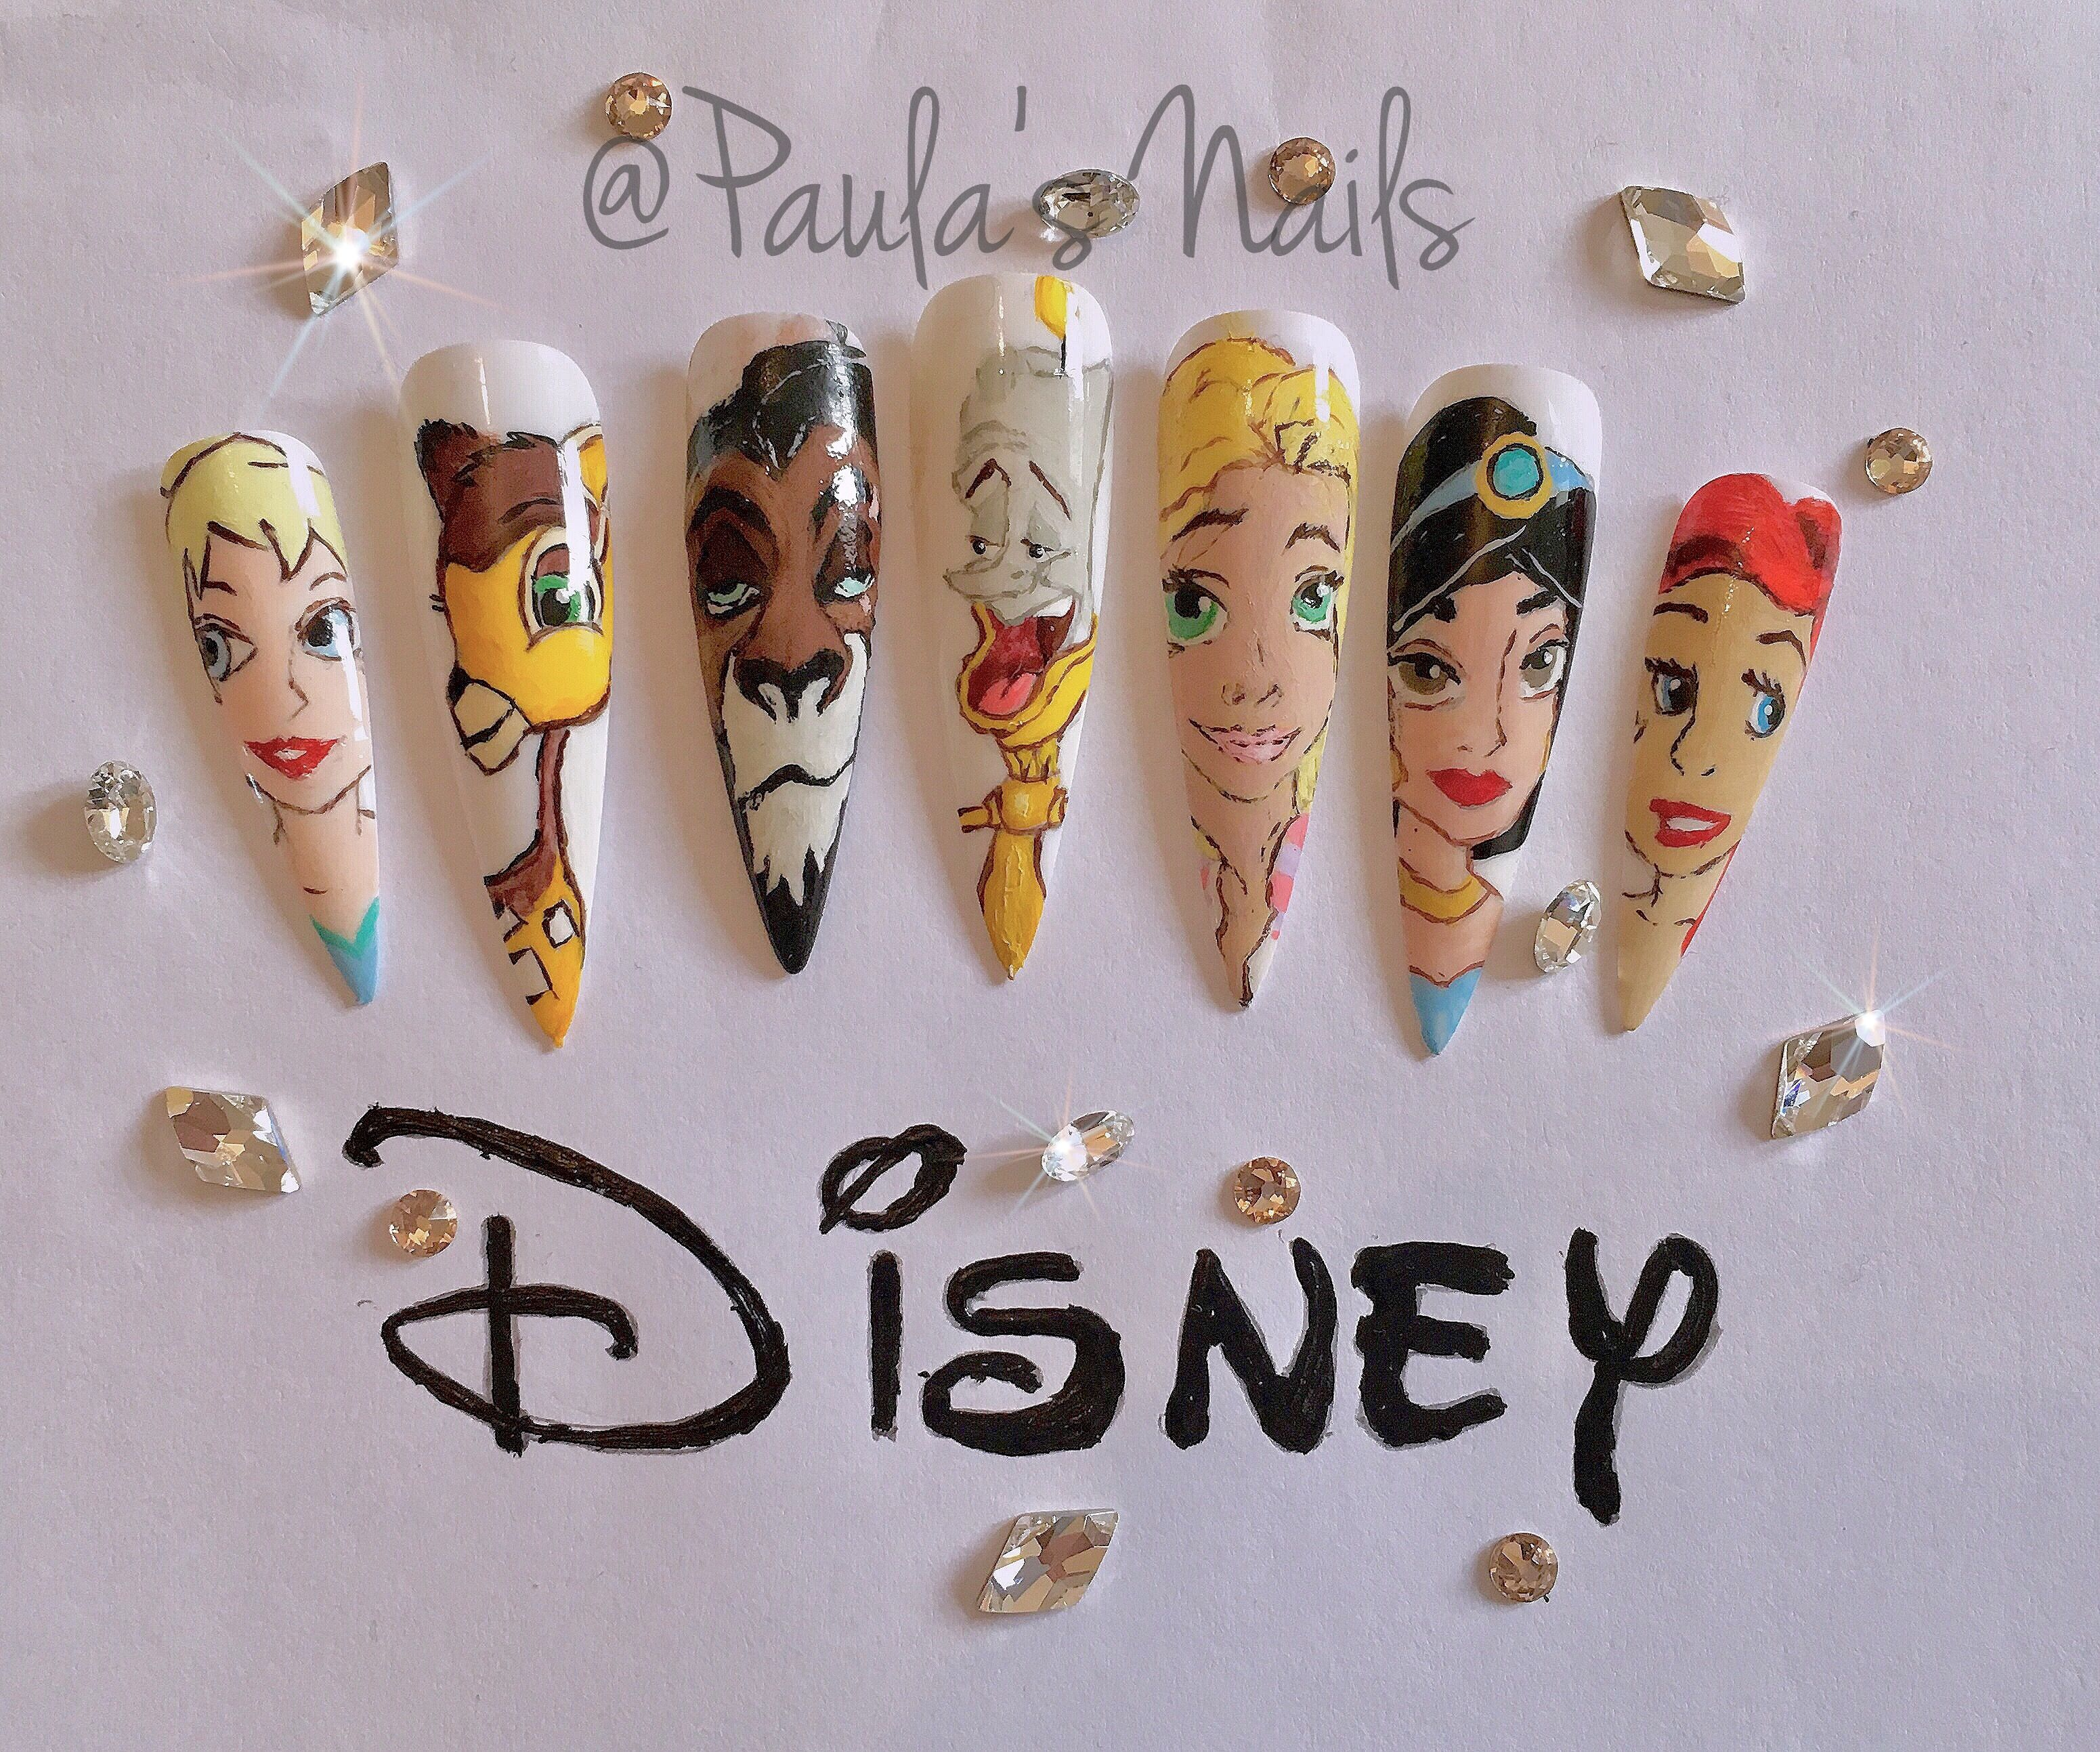 Paula\'s Nails Disney nail art my best work yet #Disney | Acrylic ...